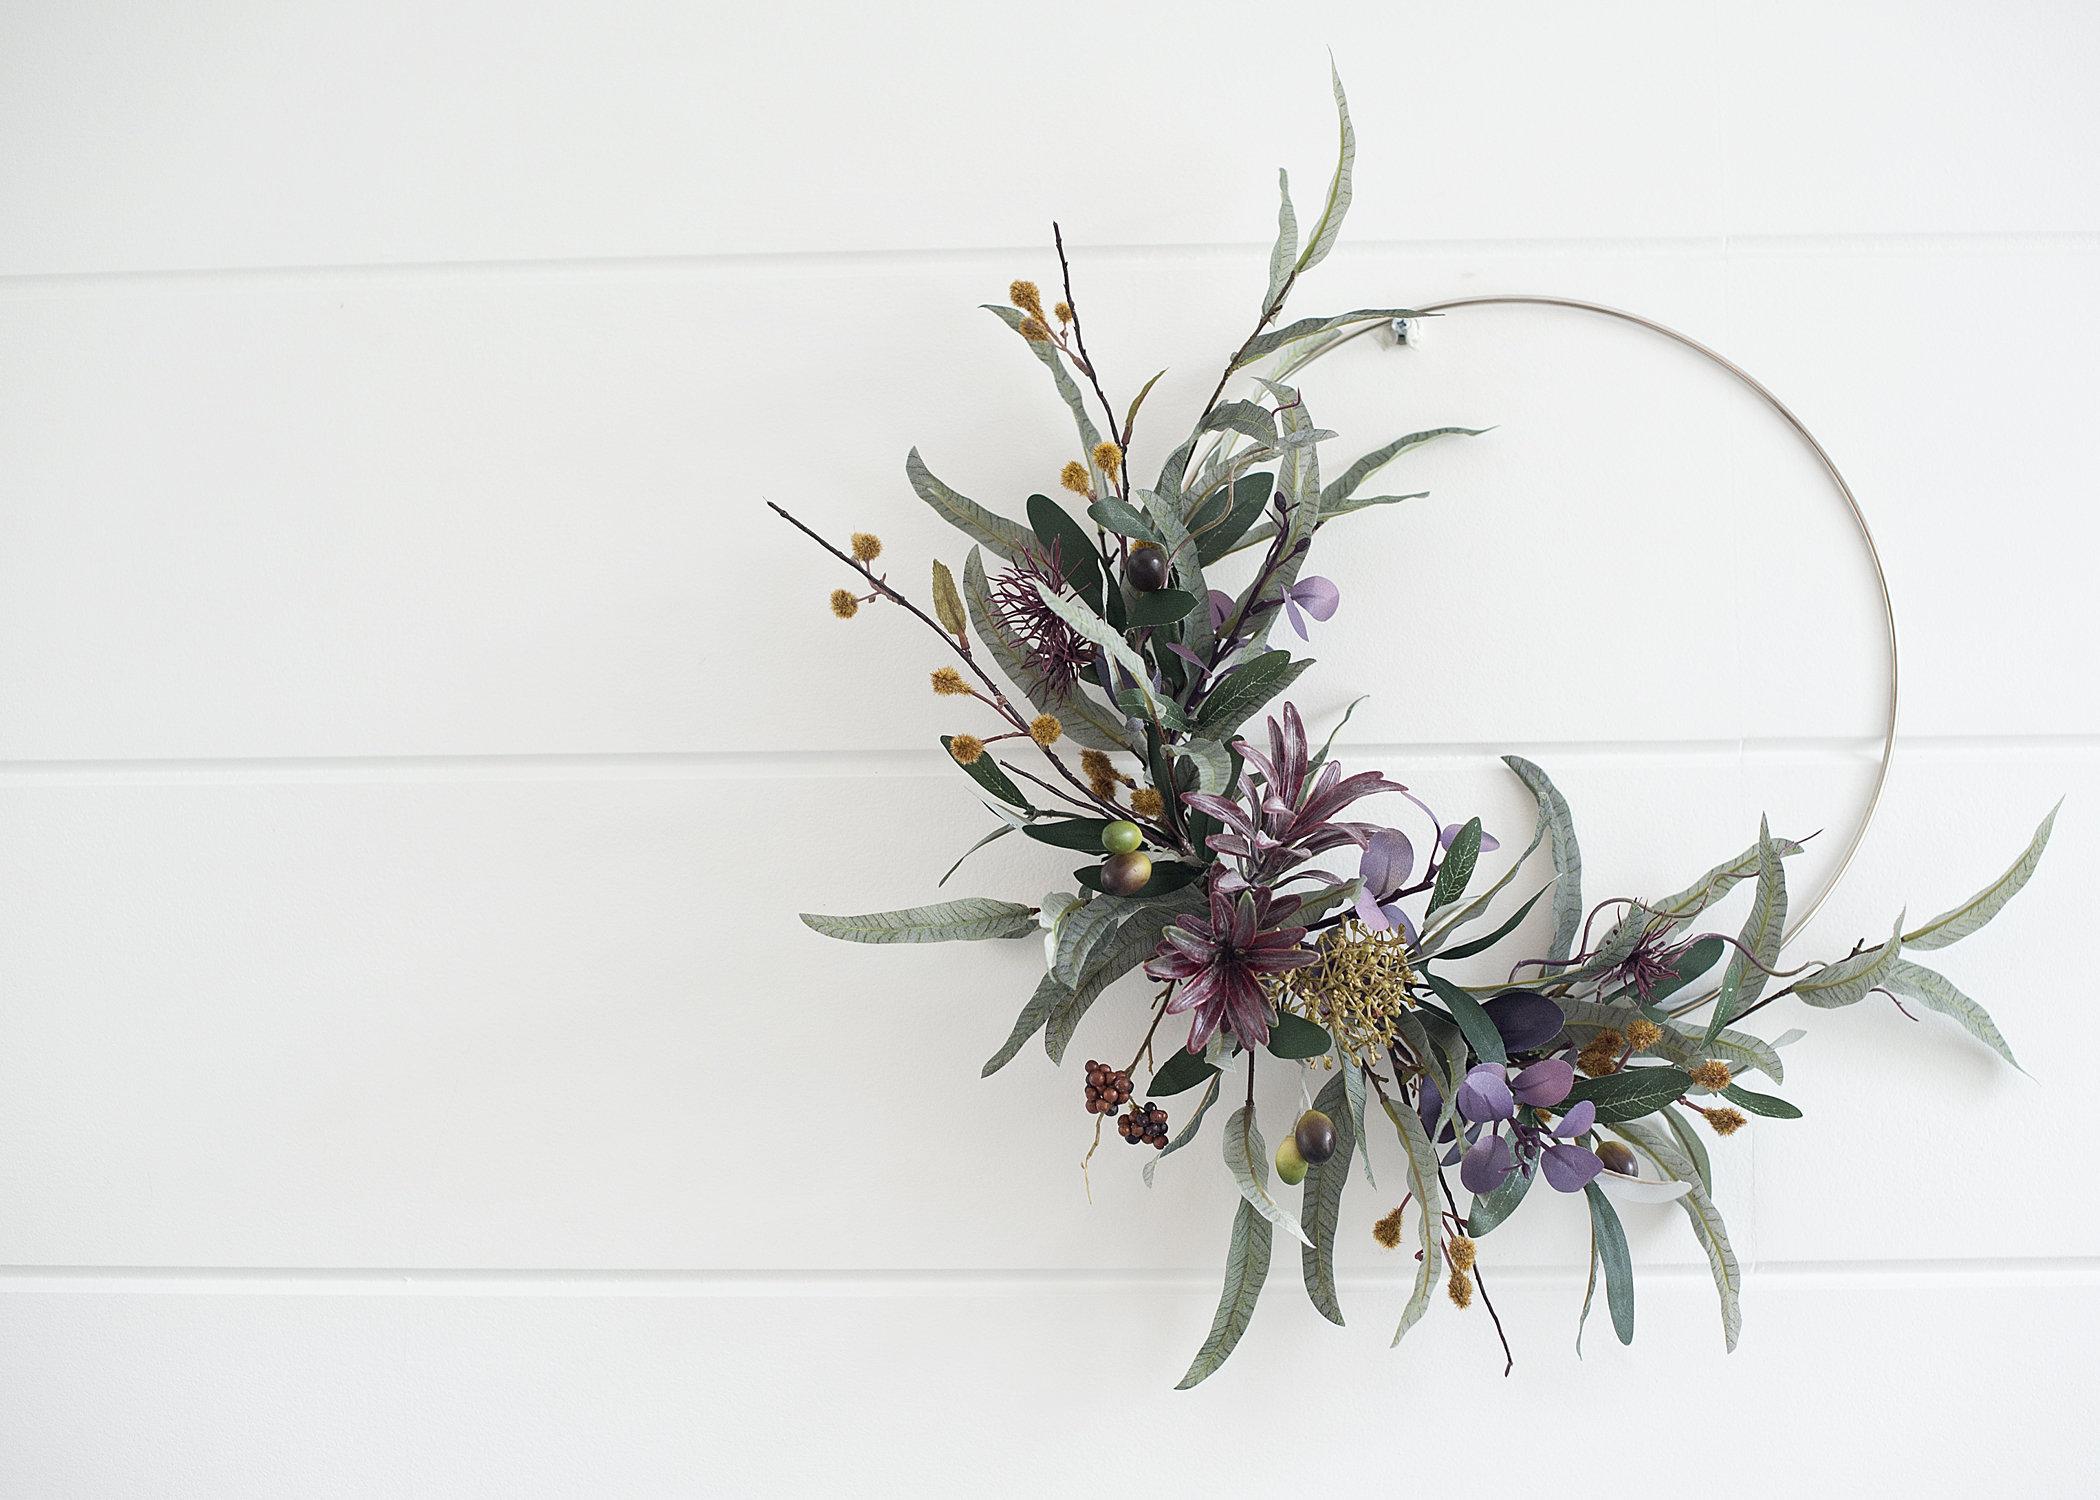 Modern olive branch wreath from Etsy shop Modsugar Design